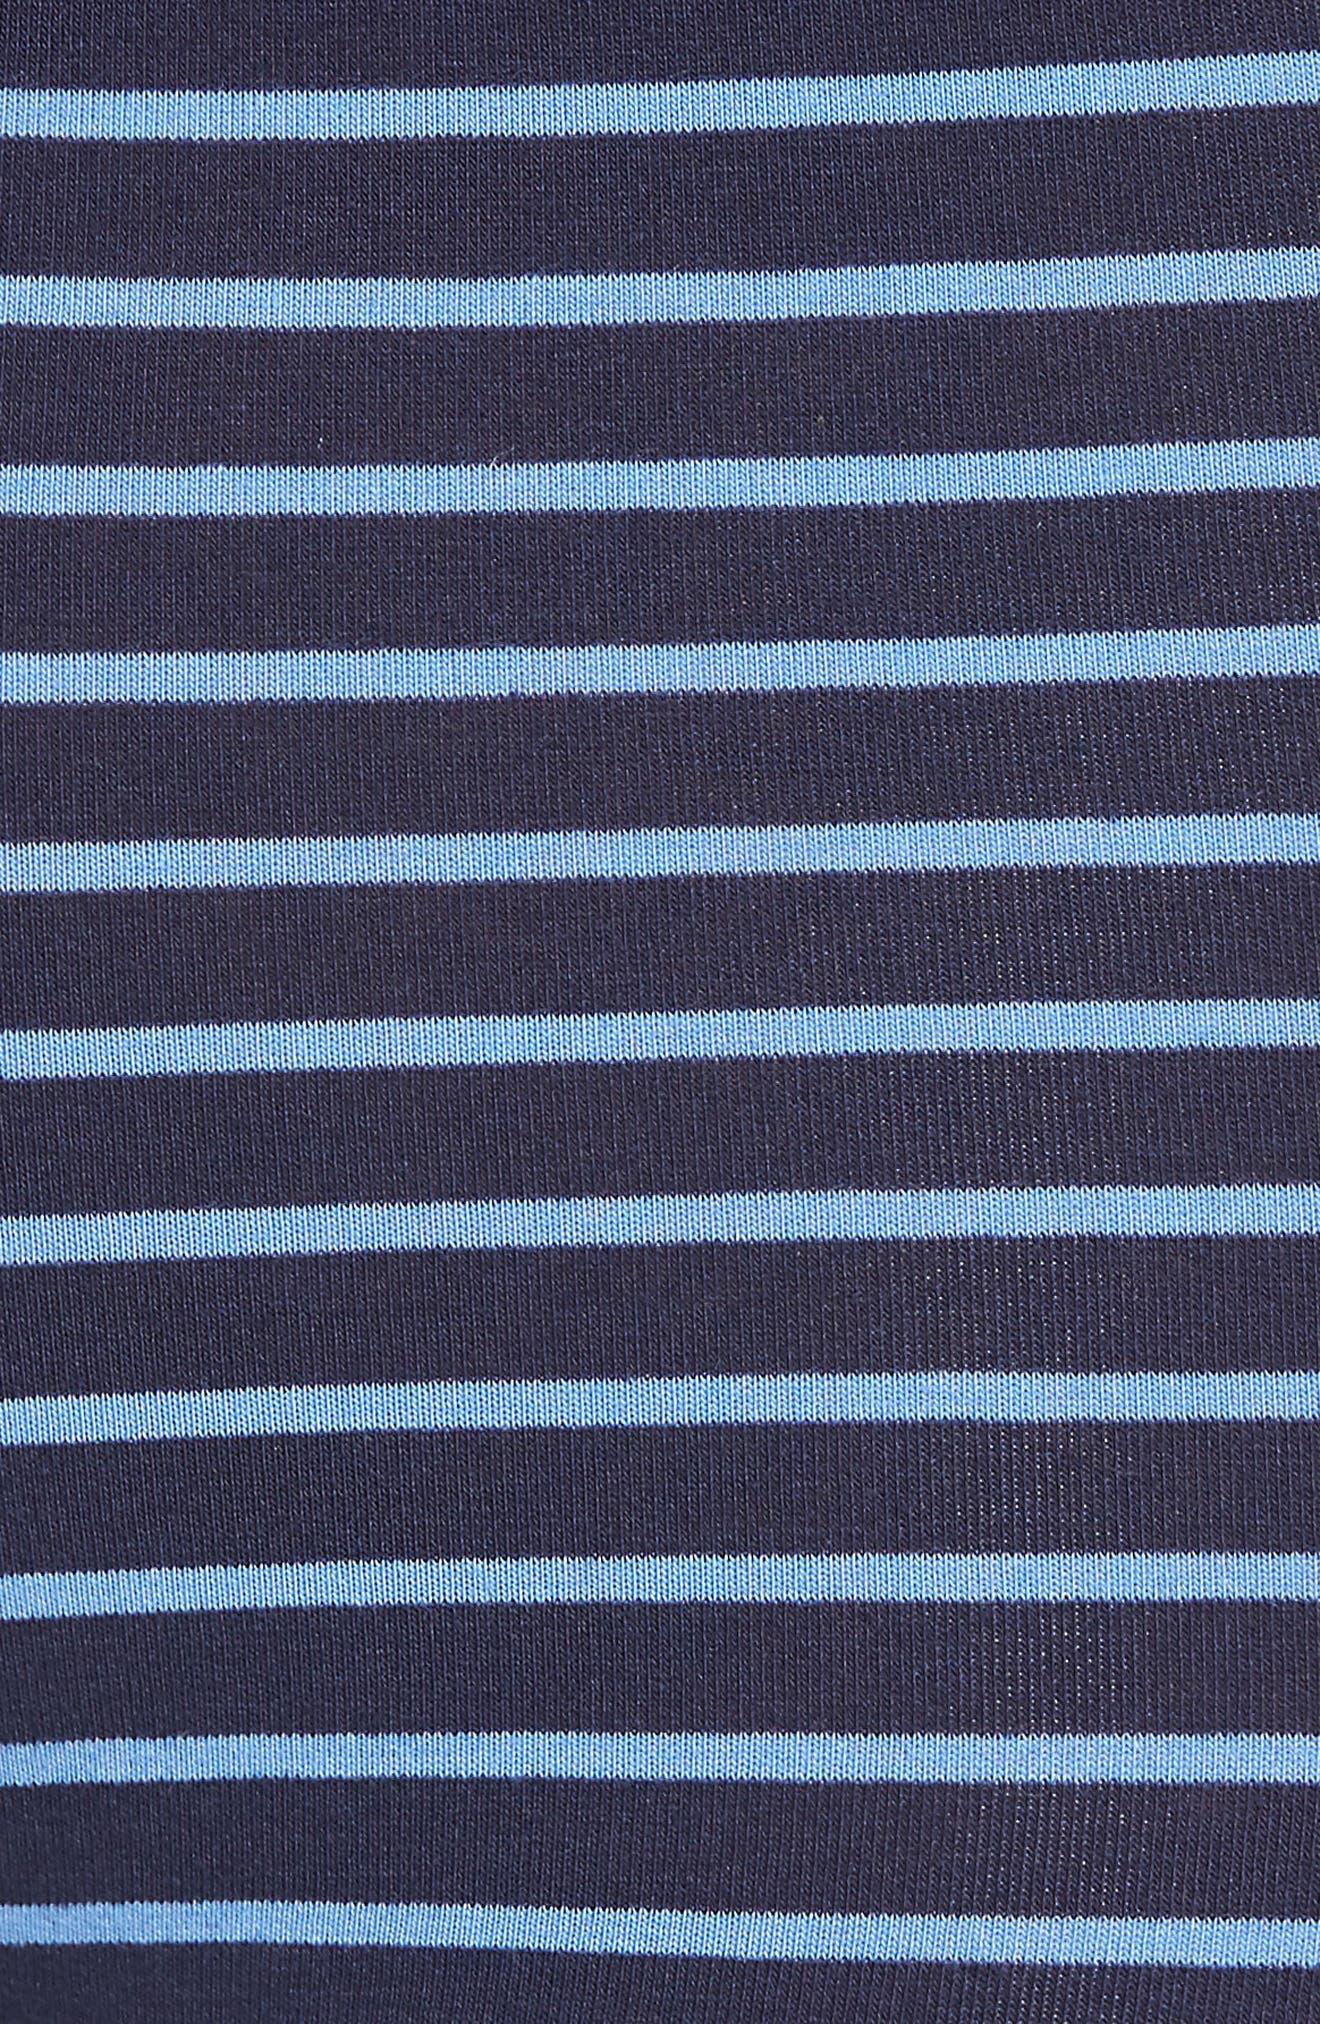 2-Pack Comfort Cotton Boxer Briefs,                             Alternate thumbnail 6, color,                             Cruise Navy/ Harbour Island